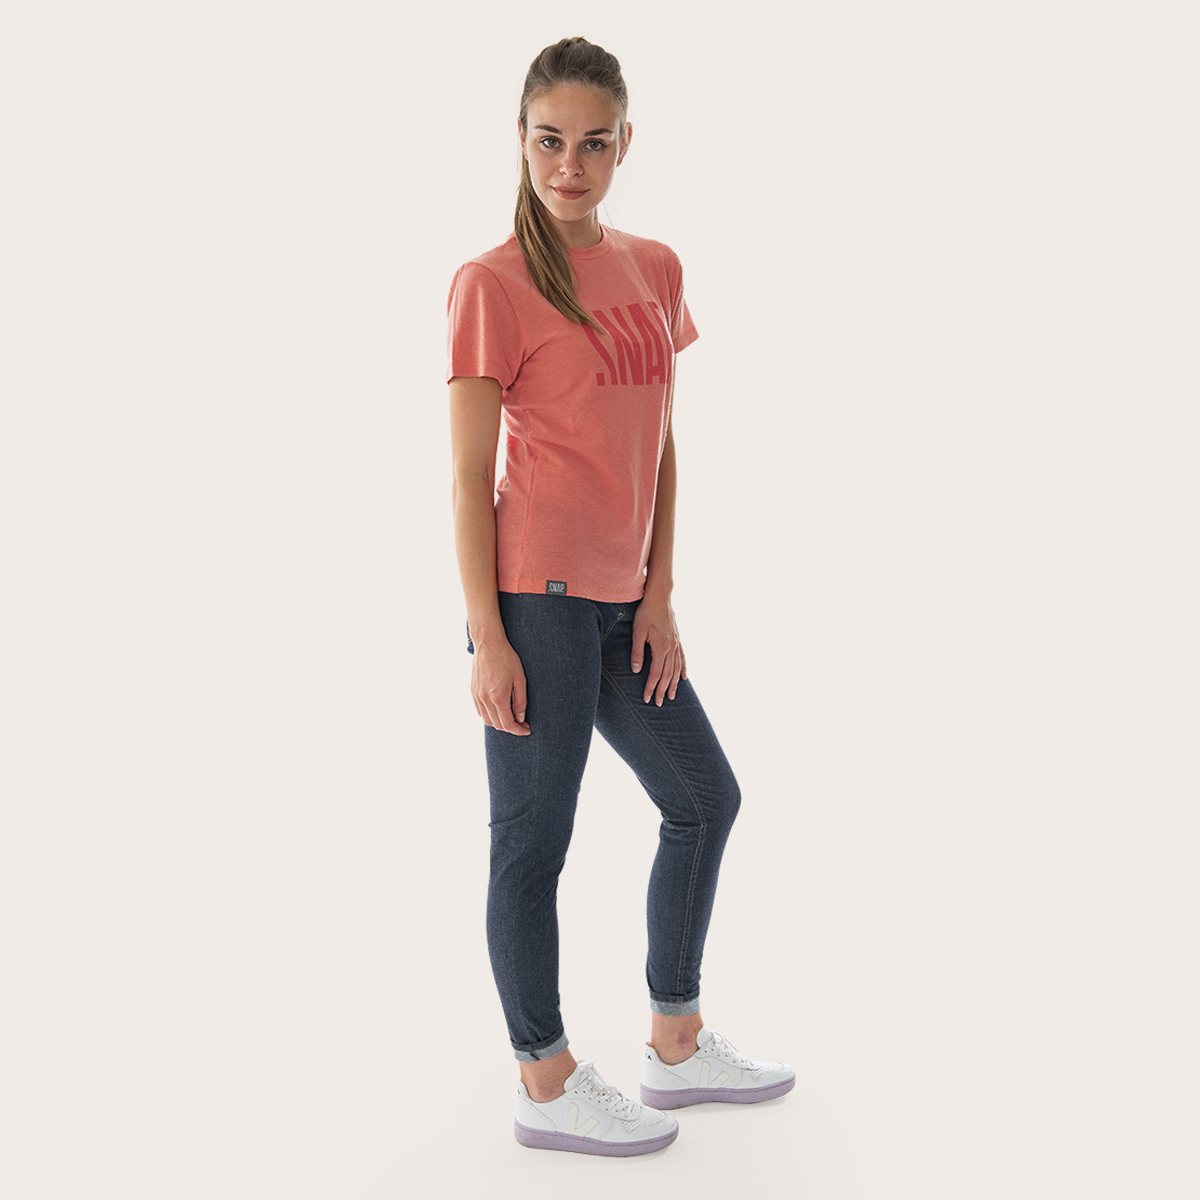 t-shirt merino wool for woman emberglow